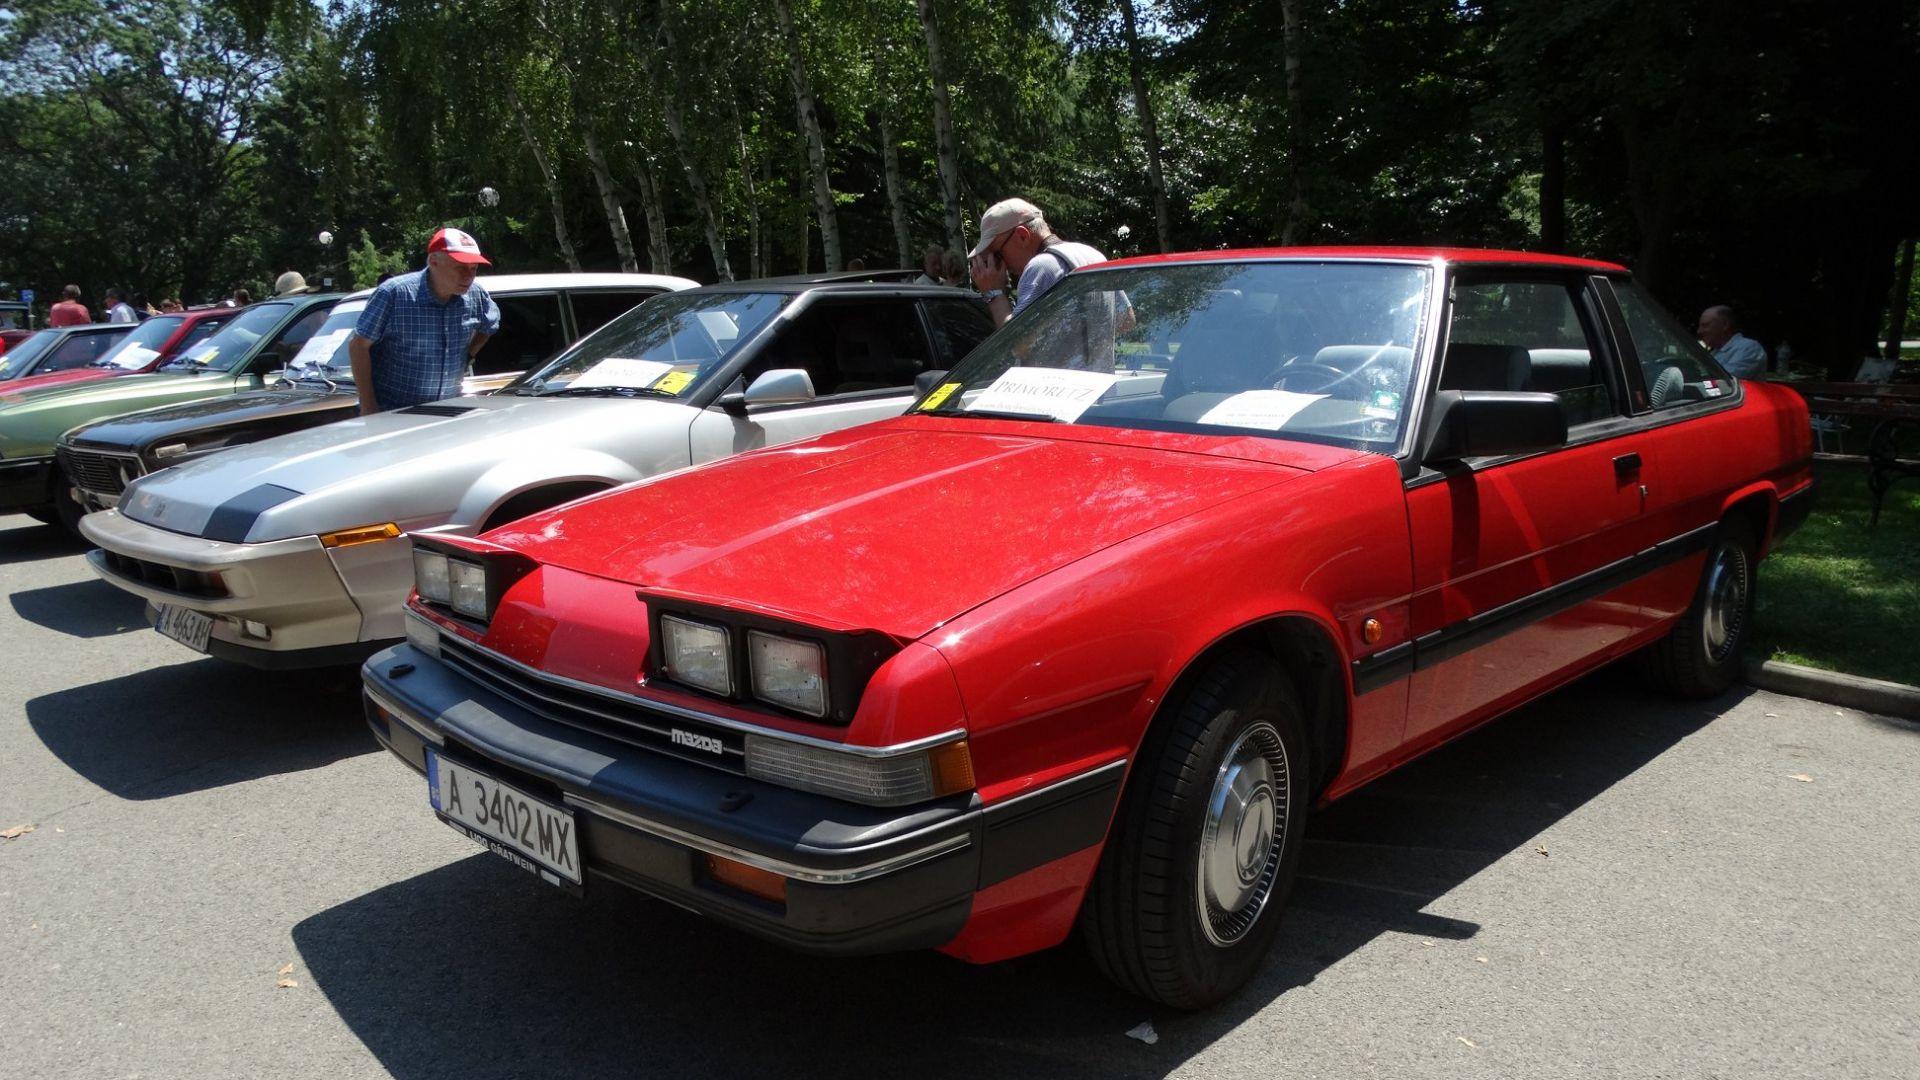 Над 200 ретро автомобила и мотоциклета от 6 държави идват в Бургас